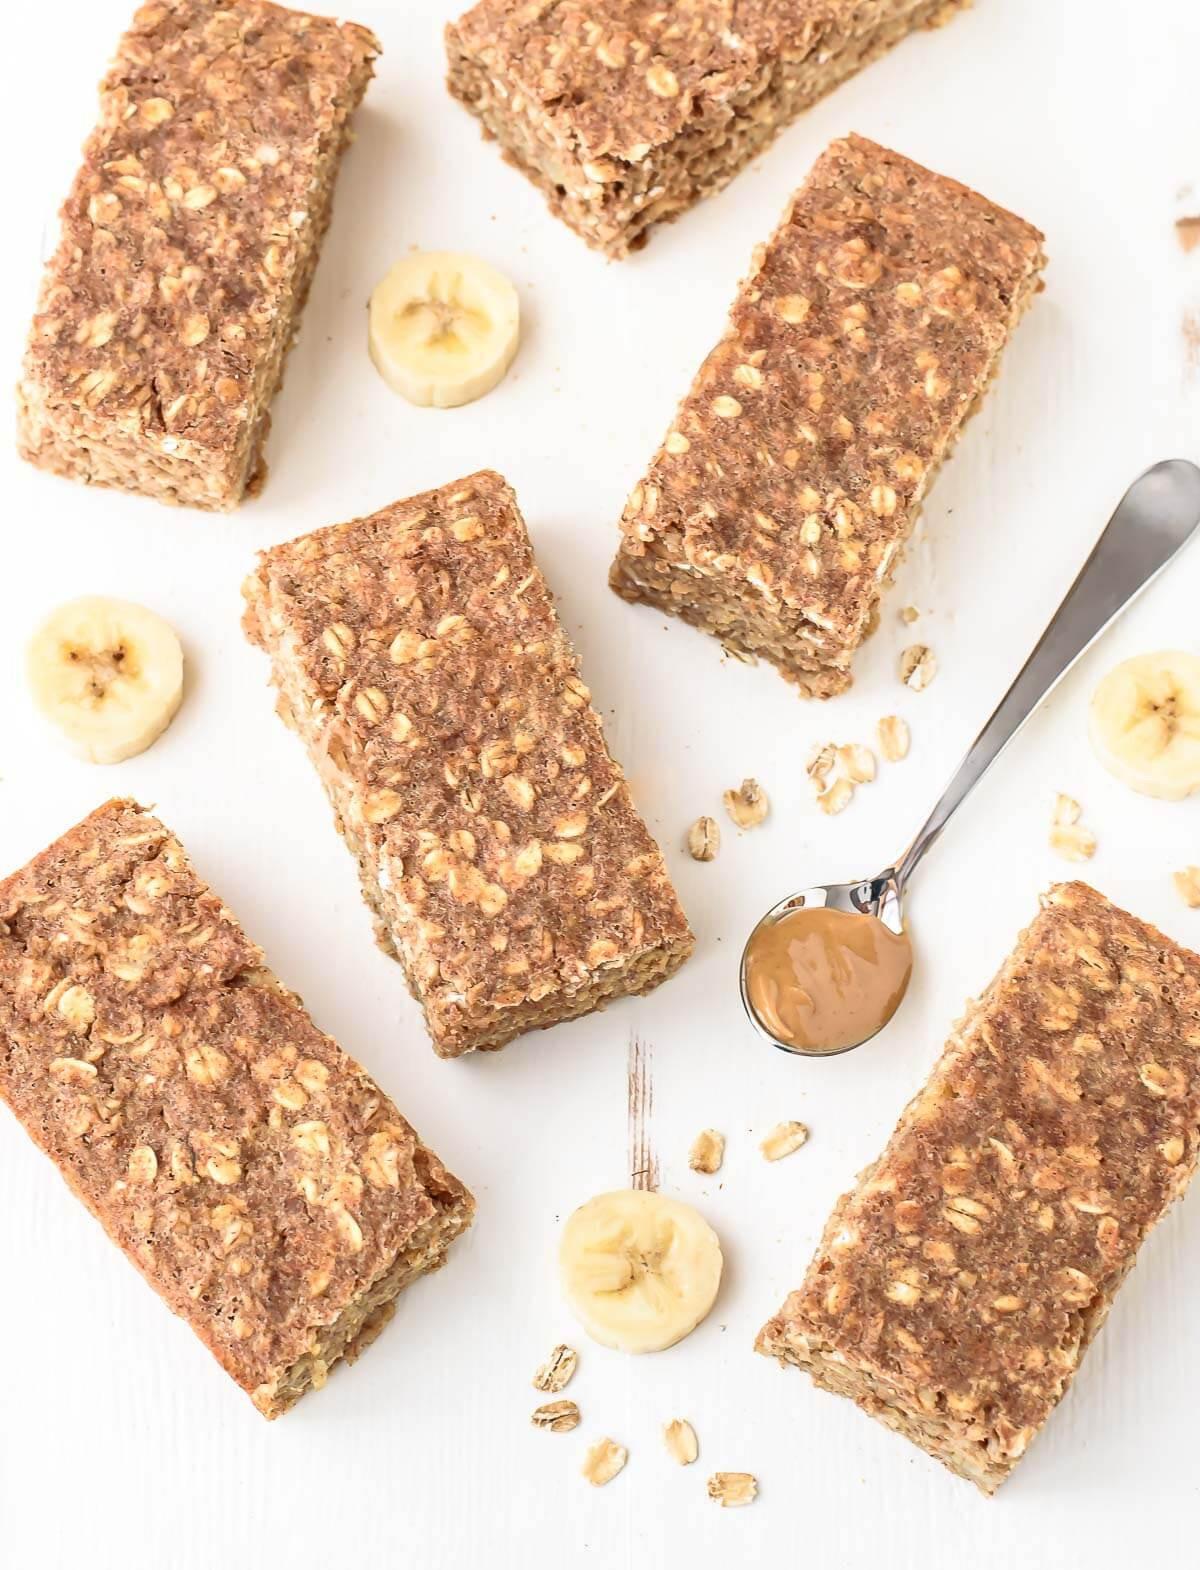 Healthy Breakfast Bar  15 Healthy Homemade Snack Bars